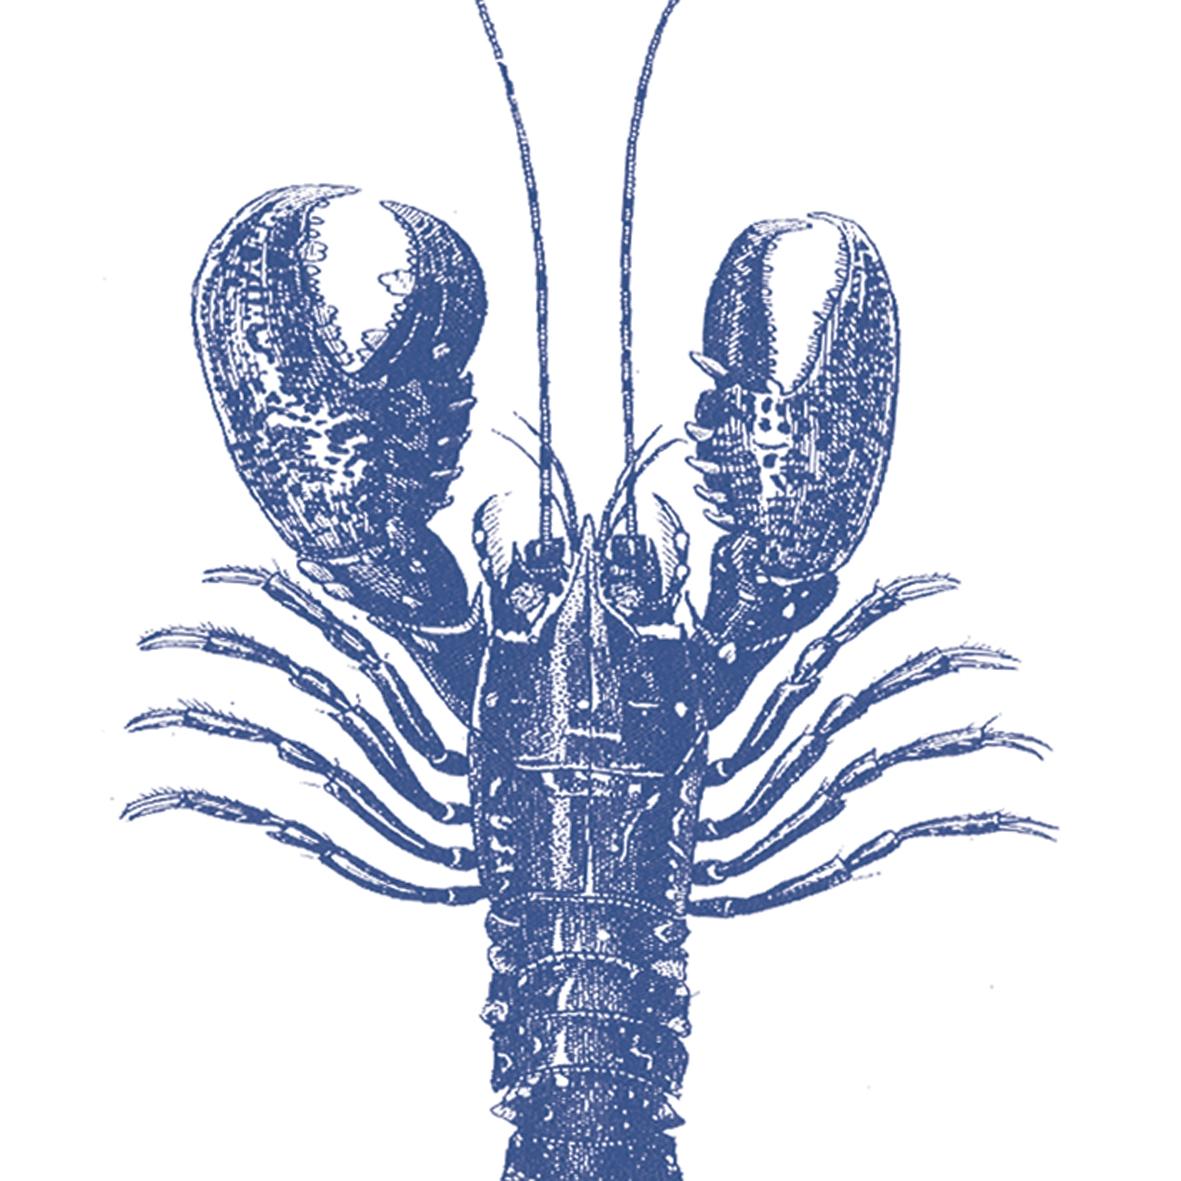 Serwetki 33x33 cm - Lobster marine 33x33cm